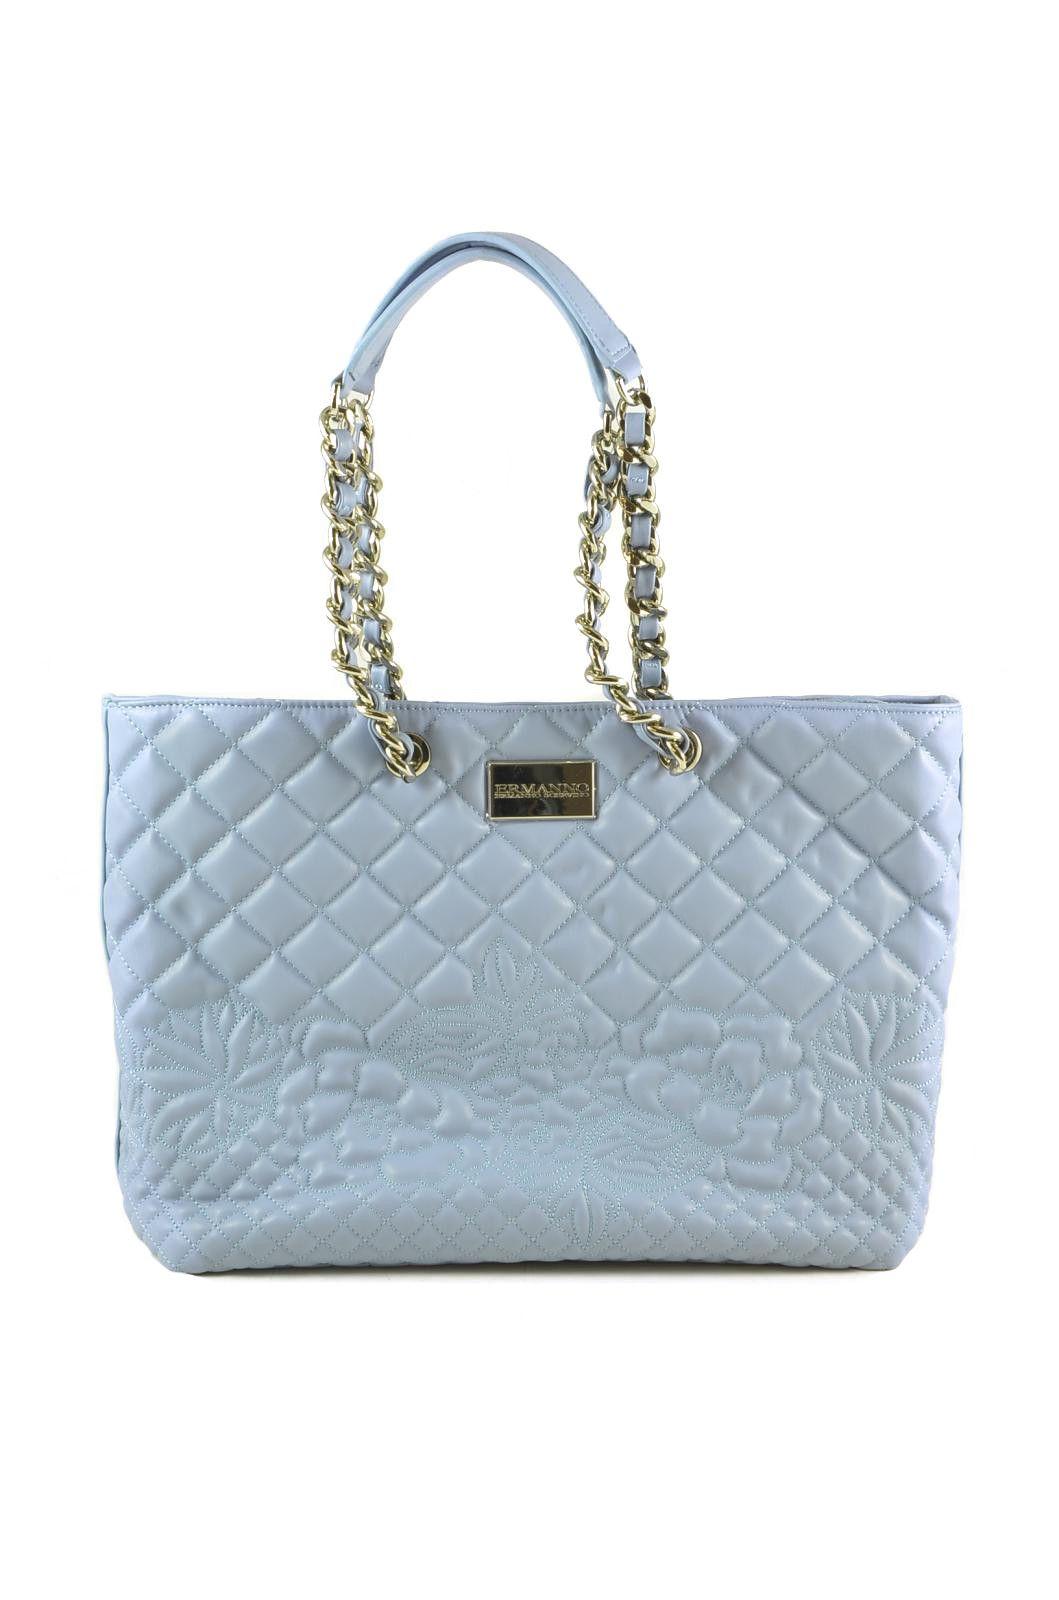 Ermanno Scervino Women's Bag In Light Blue